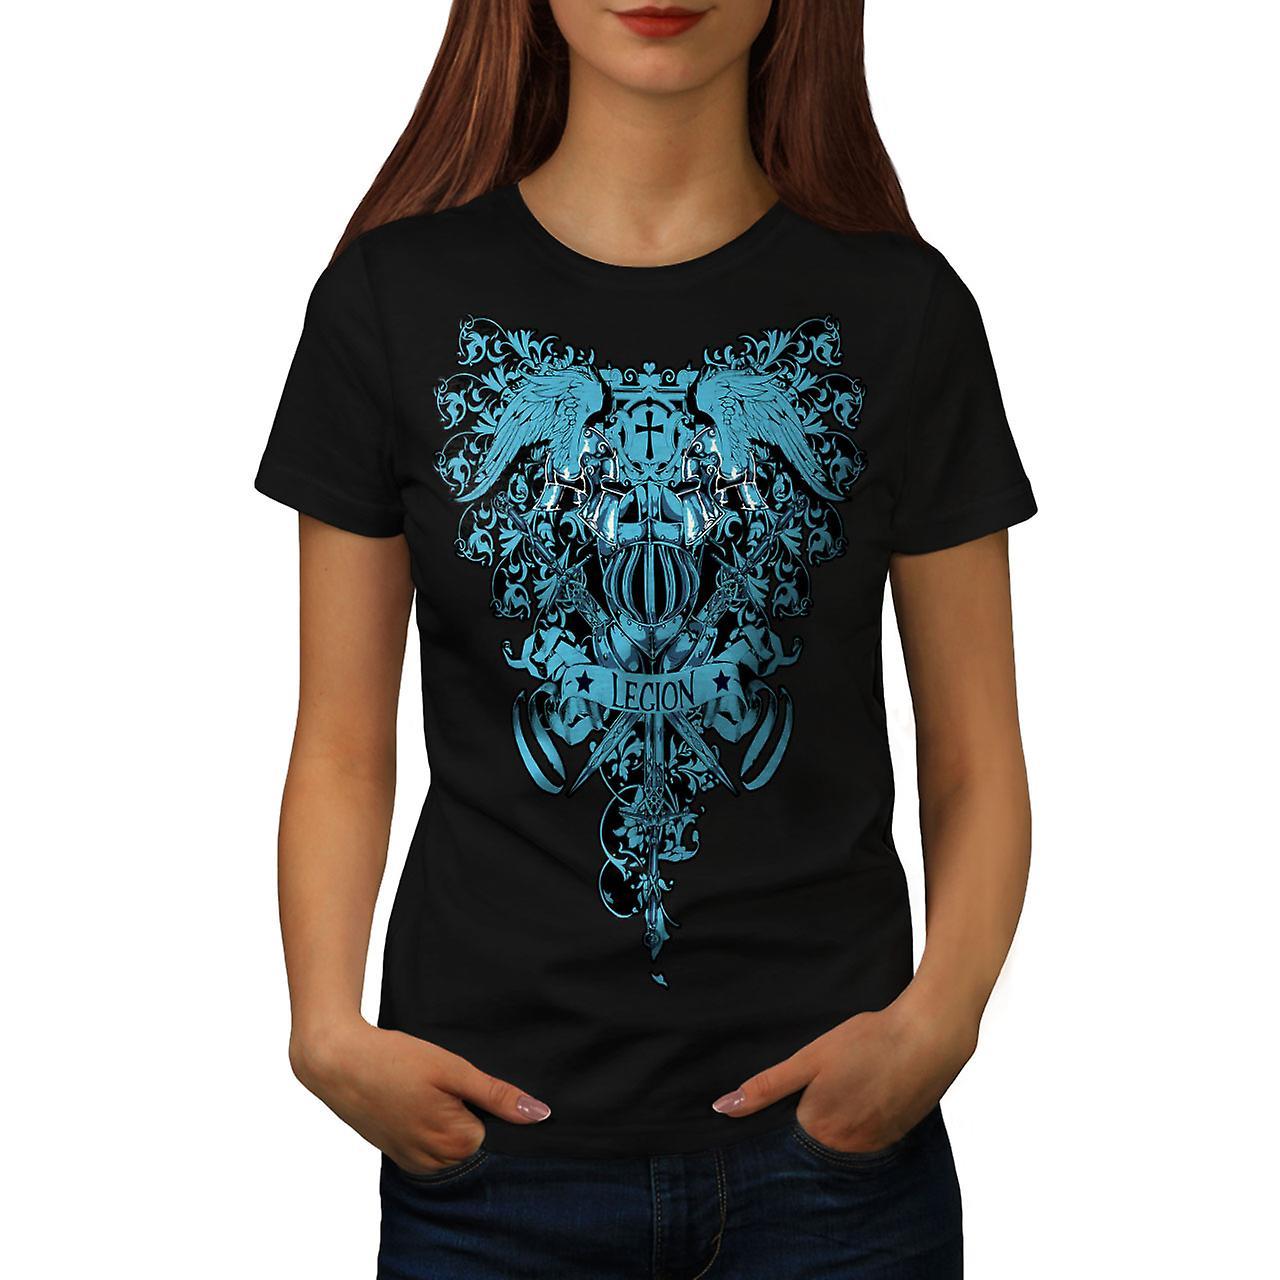 Death Legion Art Vintage Women Black T-shirt | Wellcoda